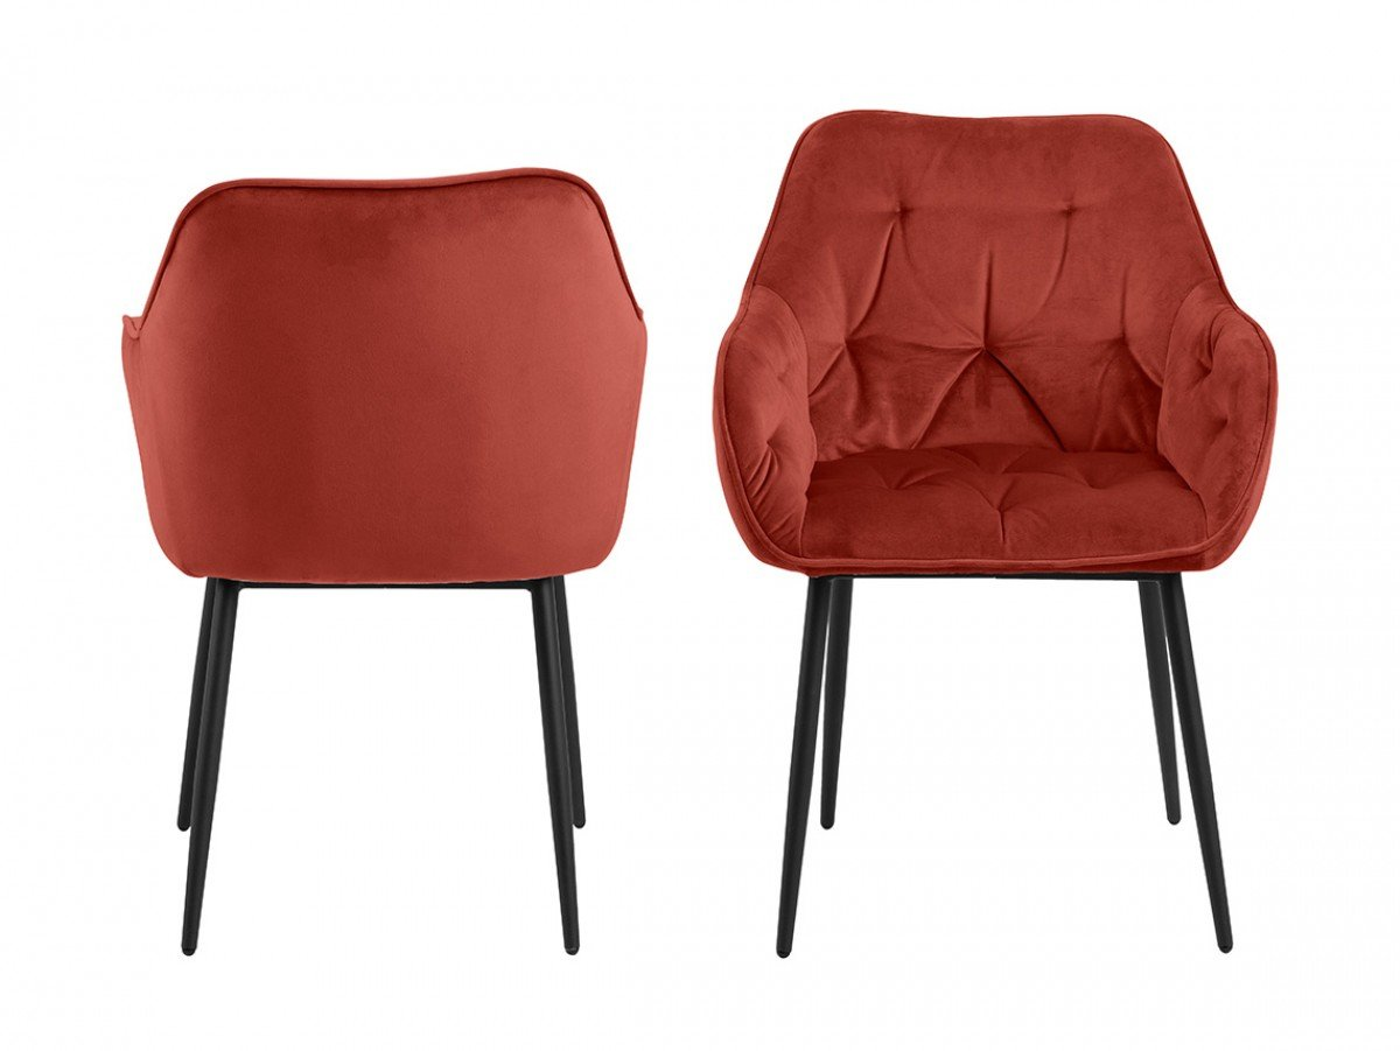 3-1 Armlehnenstuhl 99,95 (Farbwechsel) 3-Rot